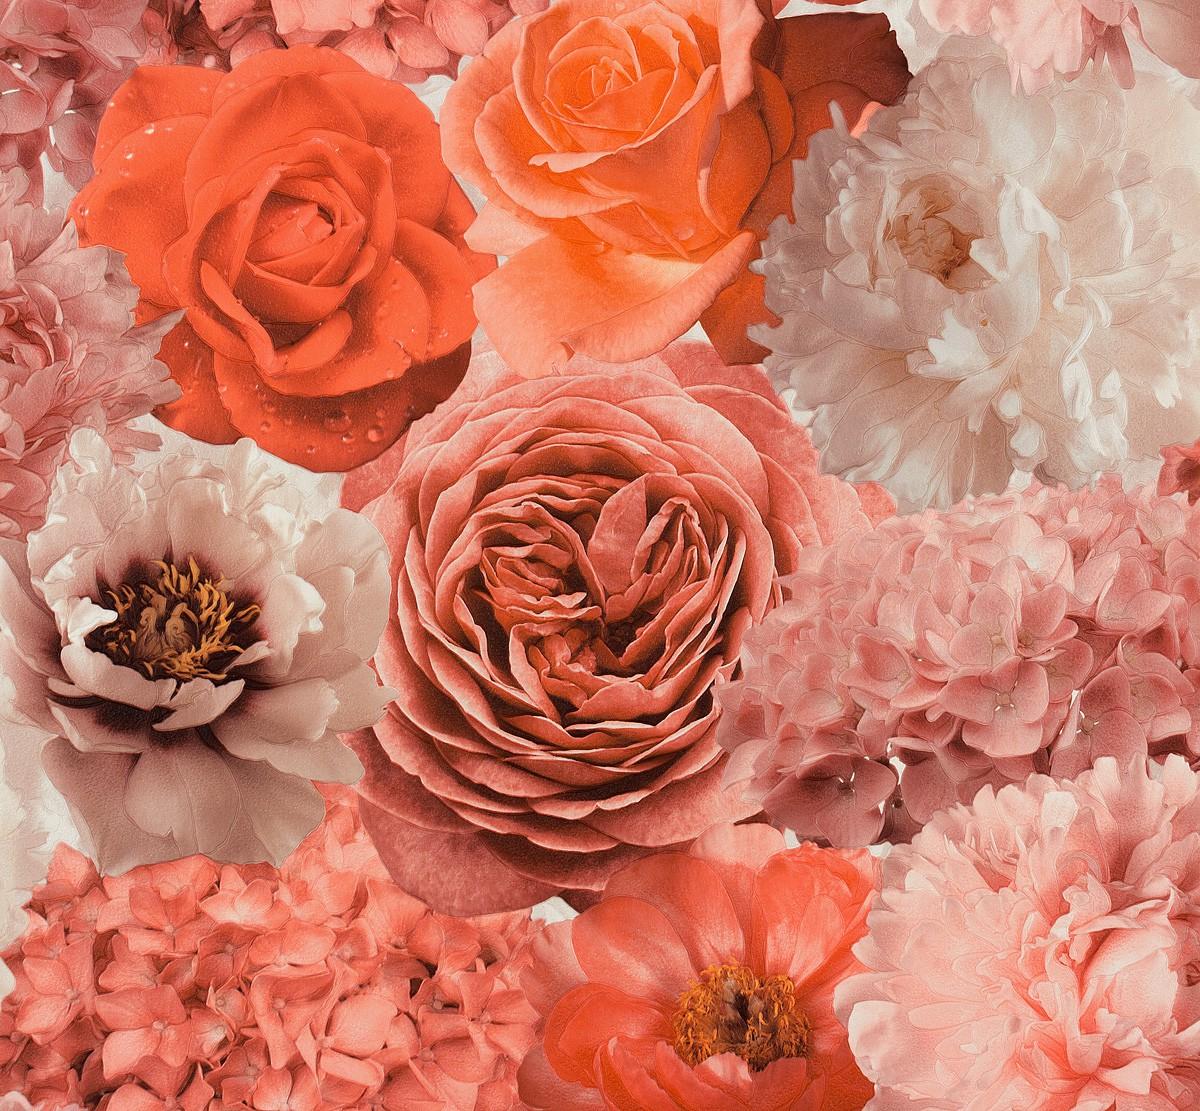 tapete design floral rot orange creme tapete rasch aqua relief 4 855807 4 46 1 ebay. Black Bedroom Furniture Sets. Home Design Ideas